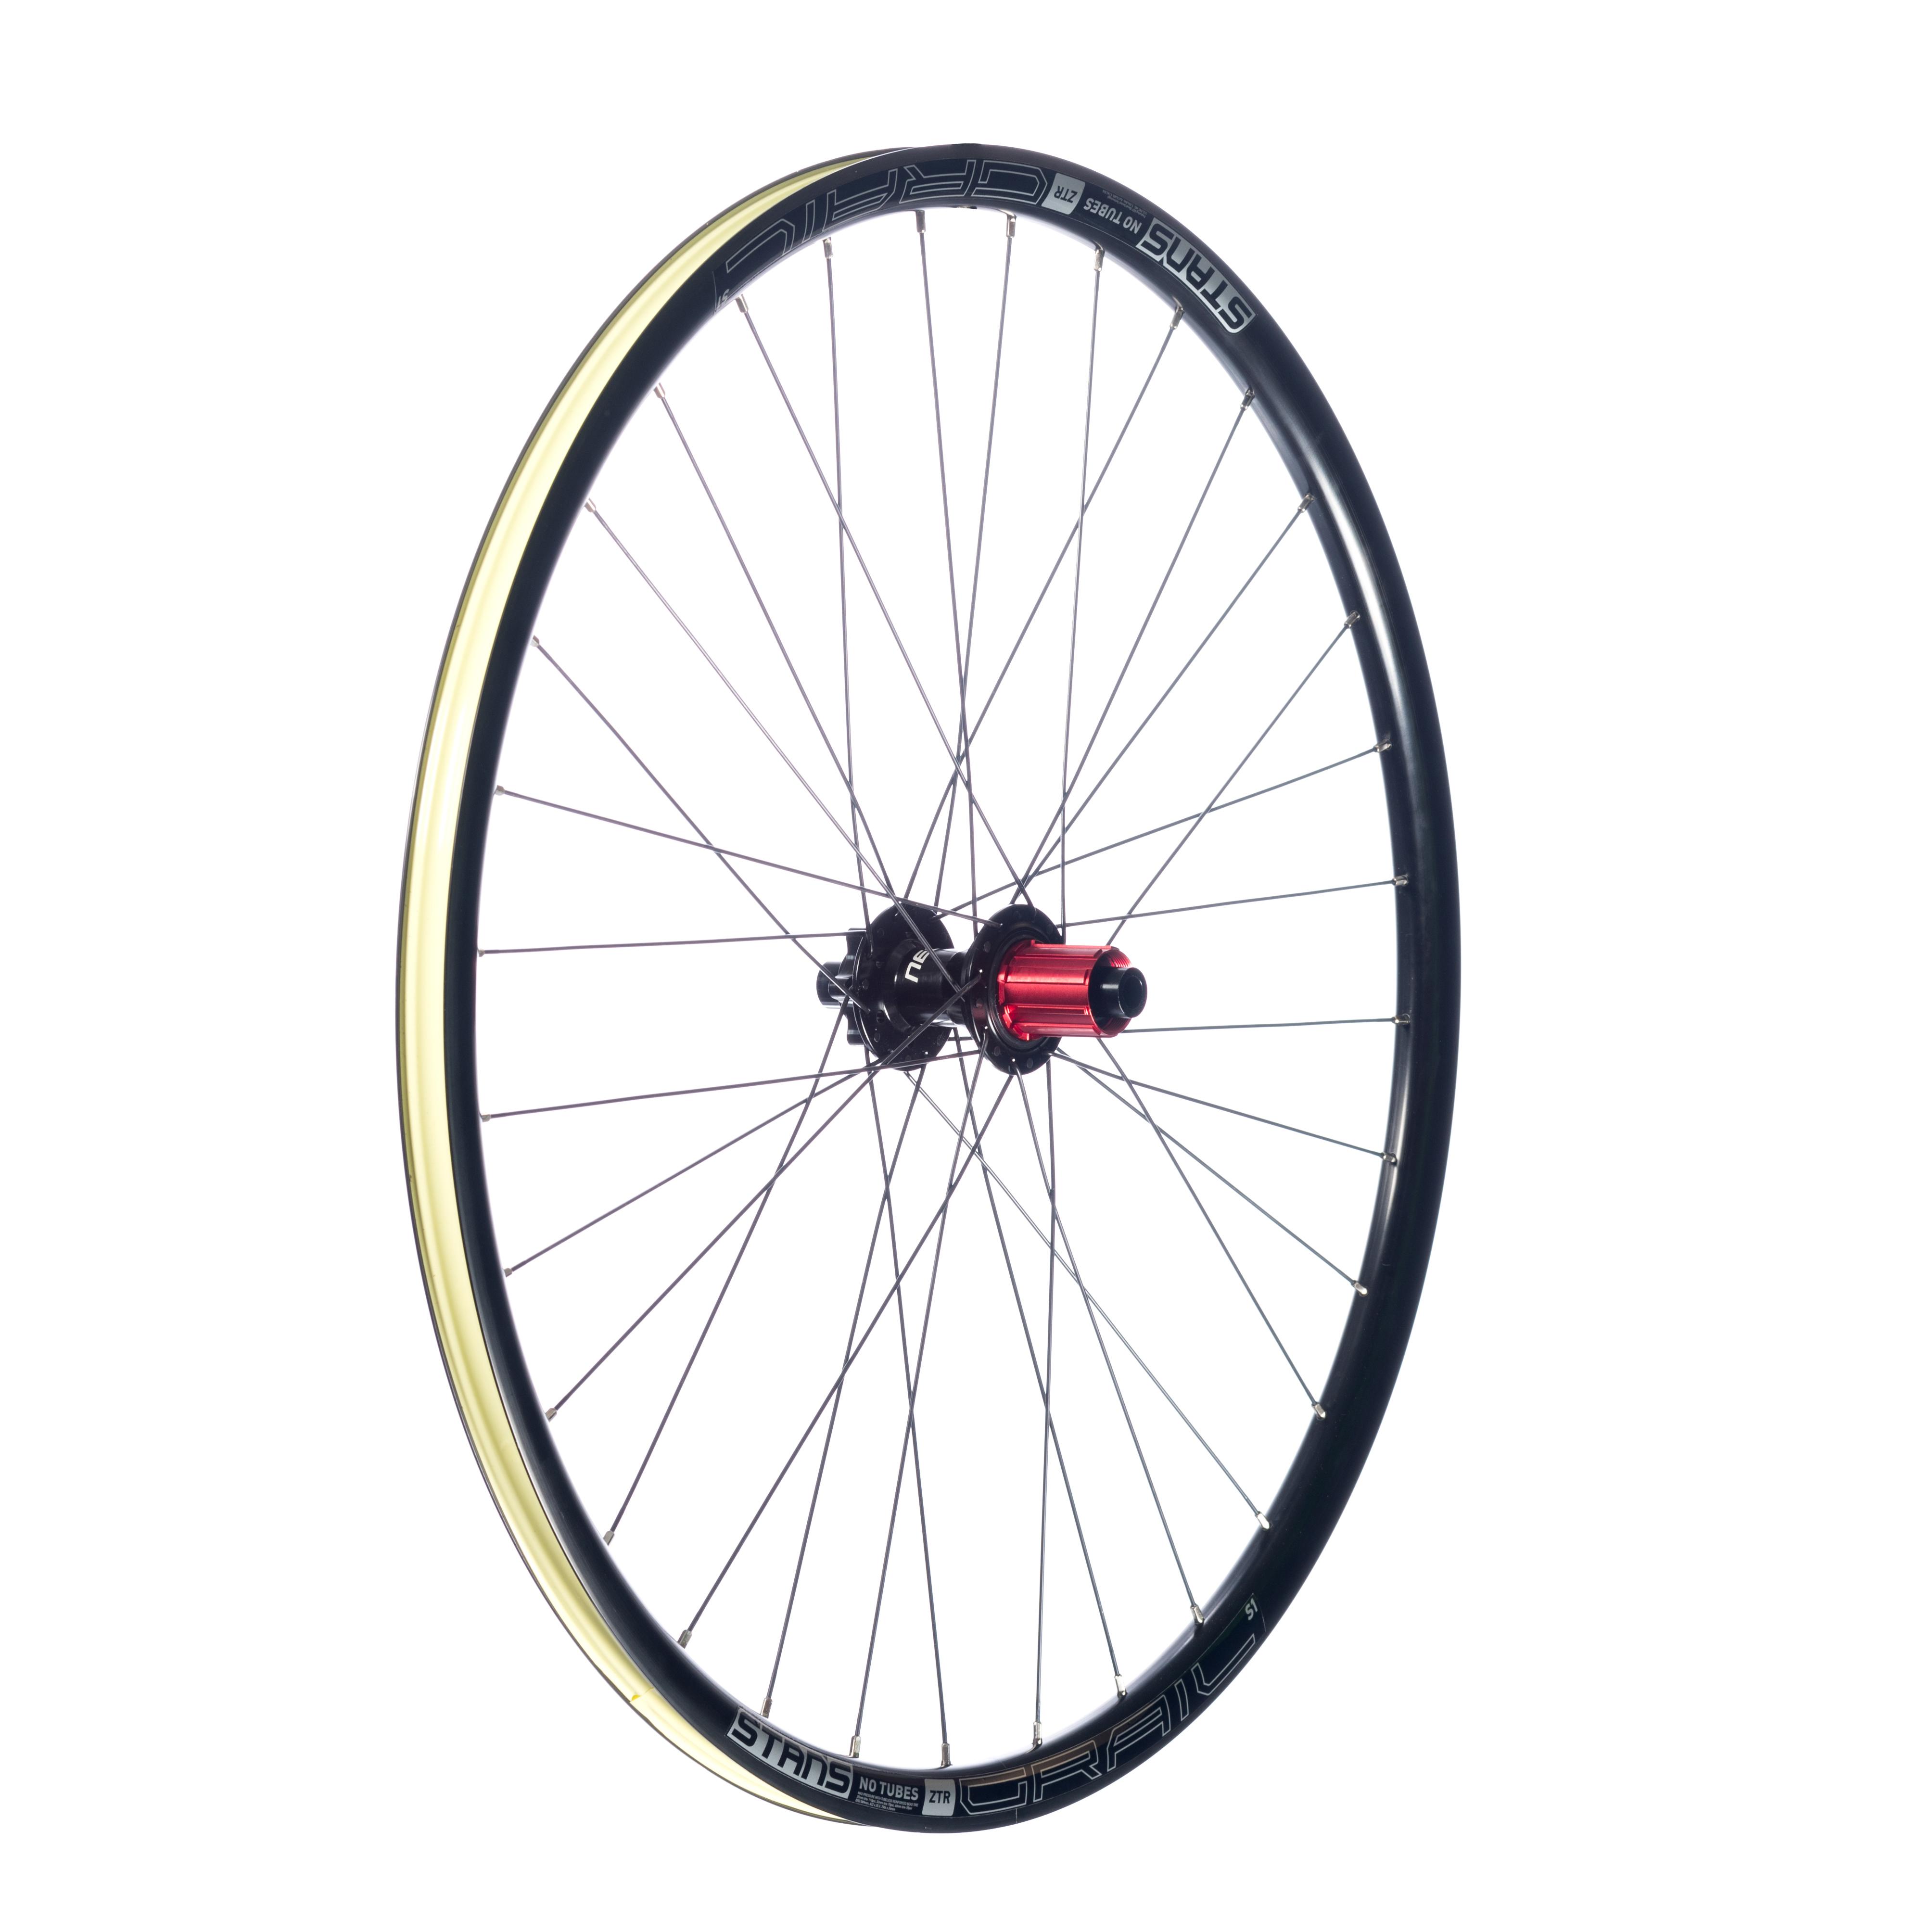 Stan/'s NoTubes Cyclocross Rim Strip 44mm Presta Valve For 700C Wheels New